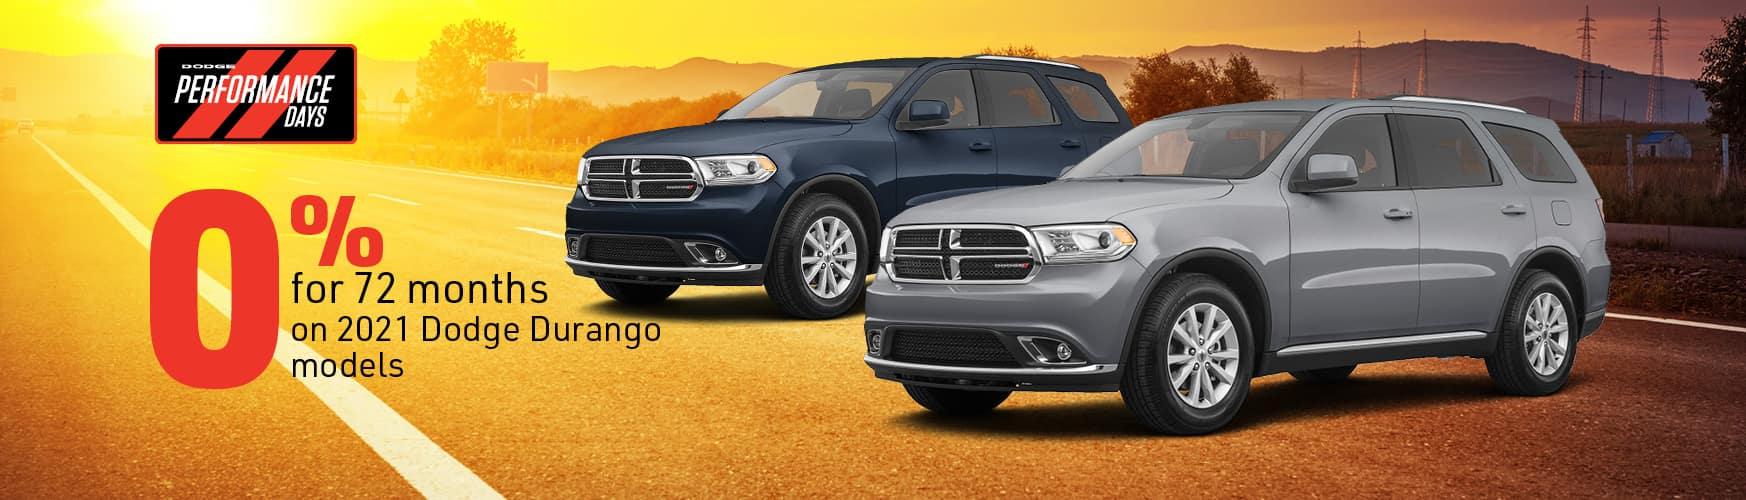 0% for 72 months on 2021 Dodge Durango models